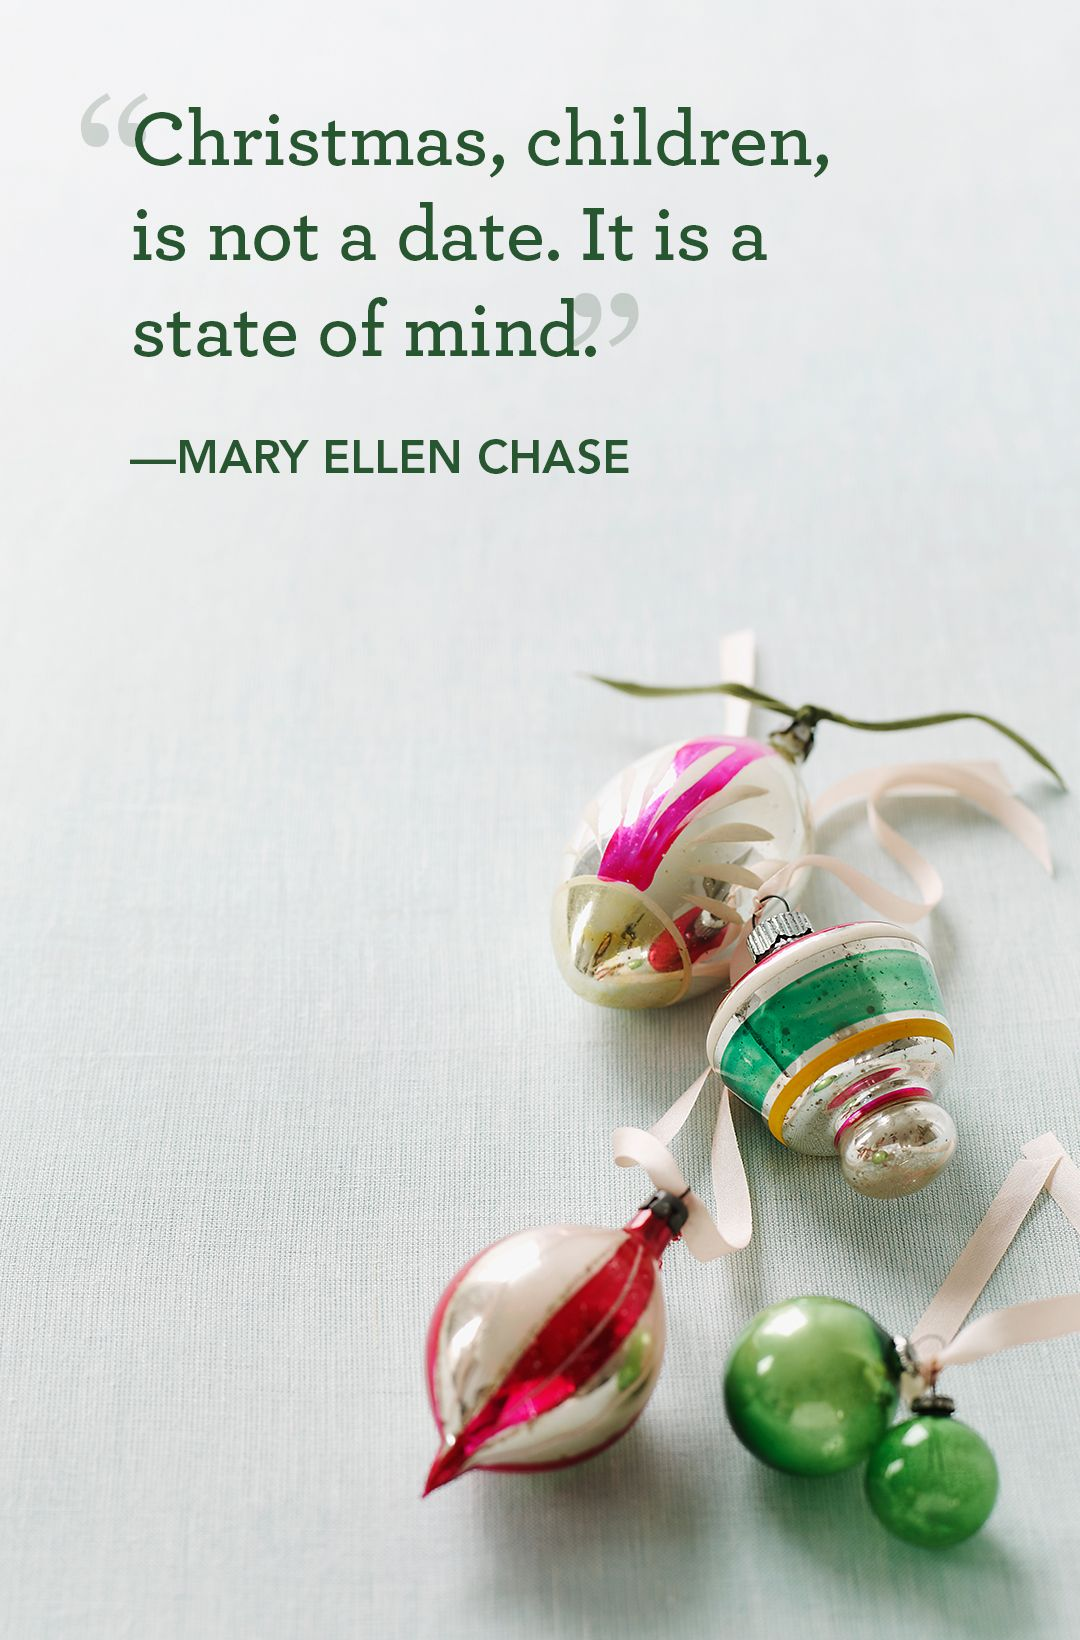 20 Merry Christmas Quotes - Inspirational Christmas Sayings and ...